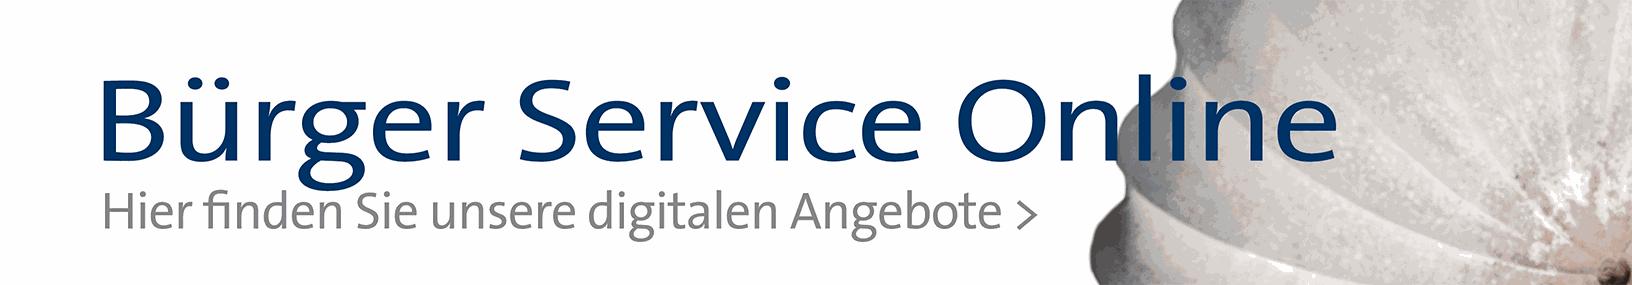 Banner: Bürger-Service Online (kleiner)